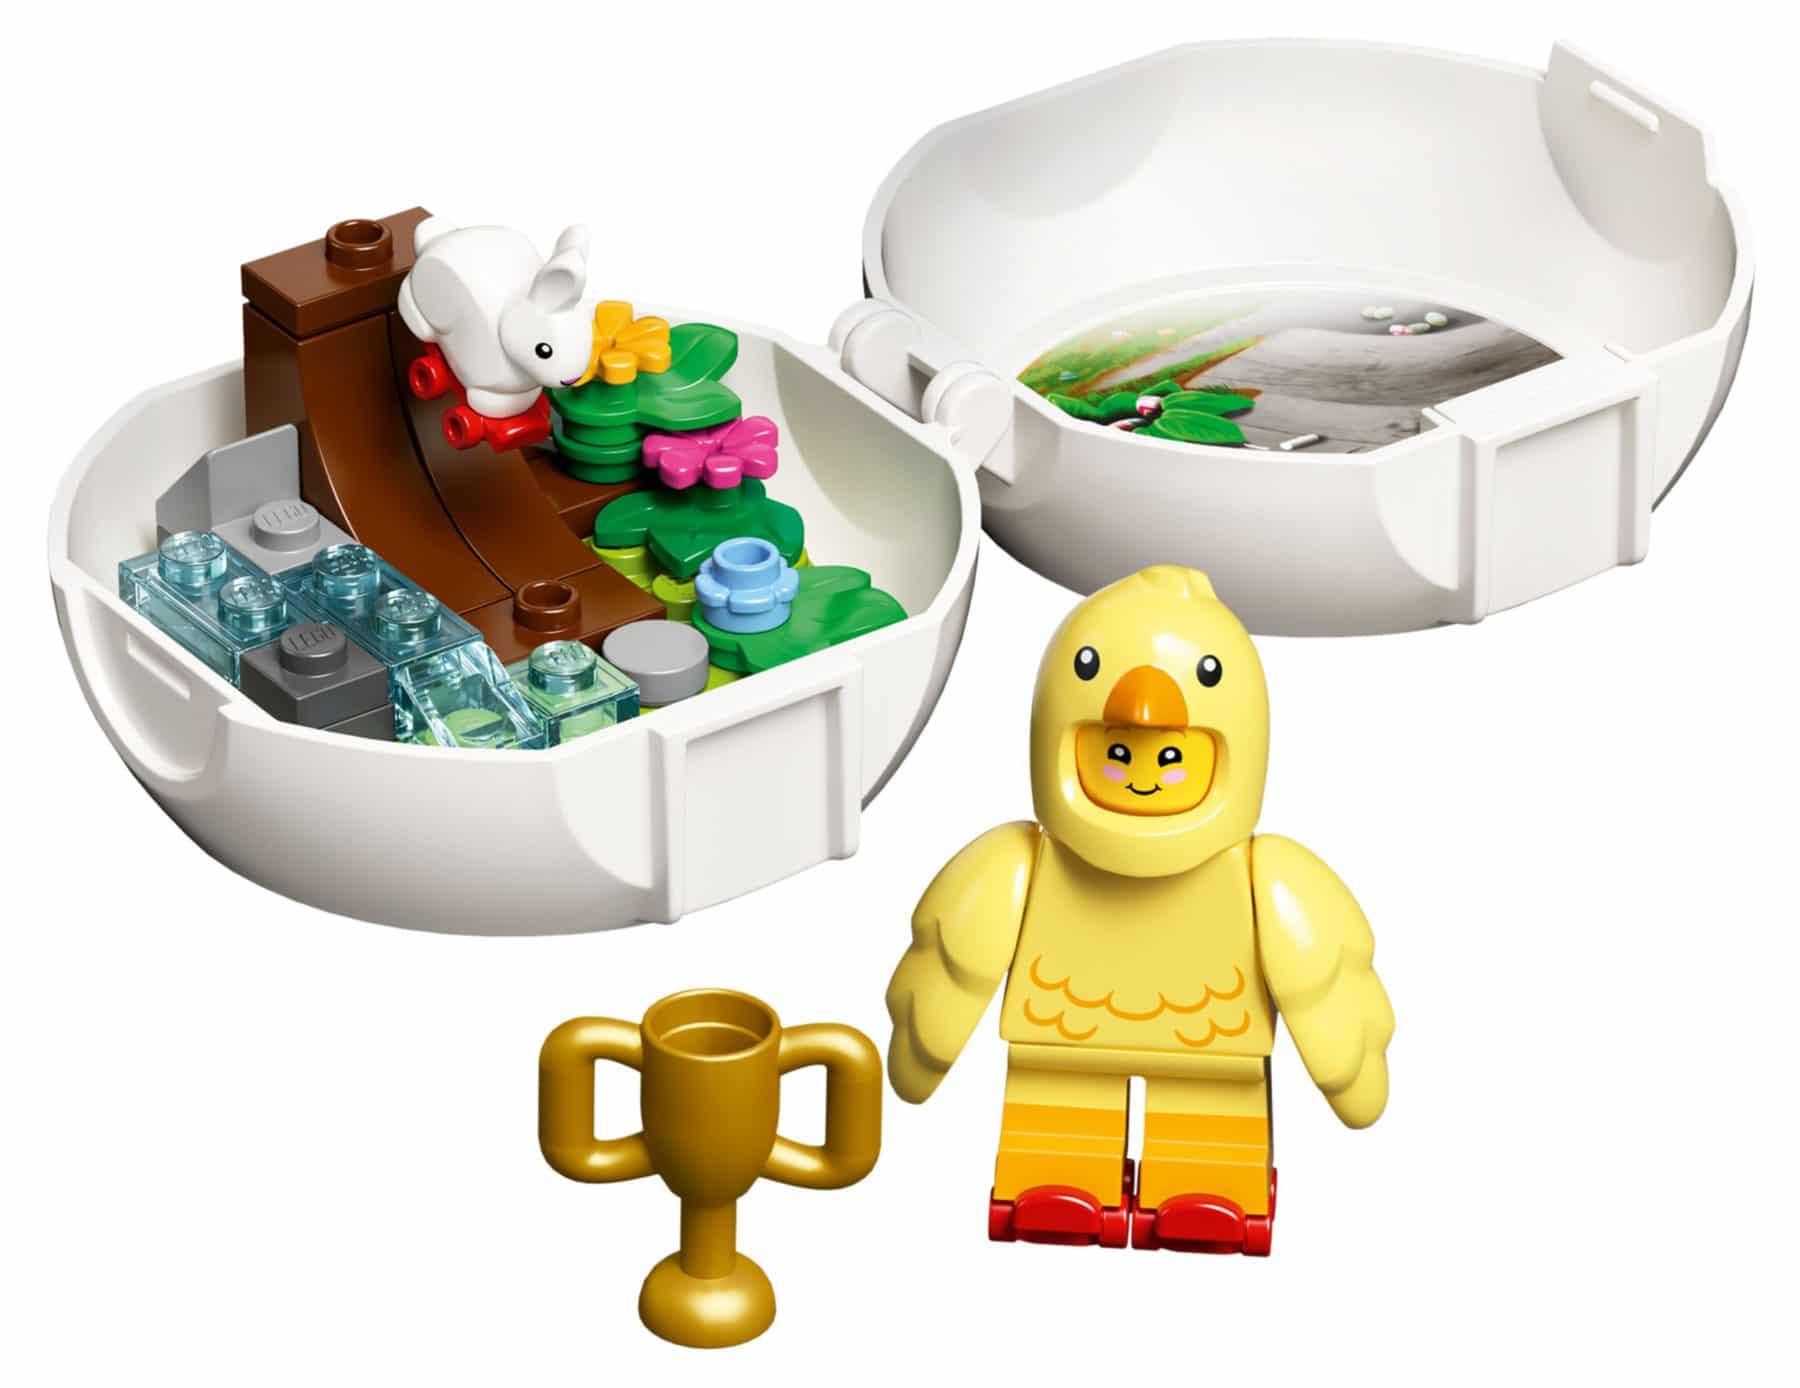 LEGO 853958 Oster Pod